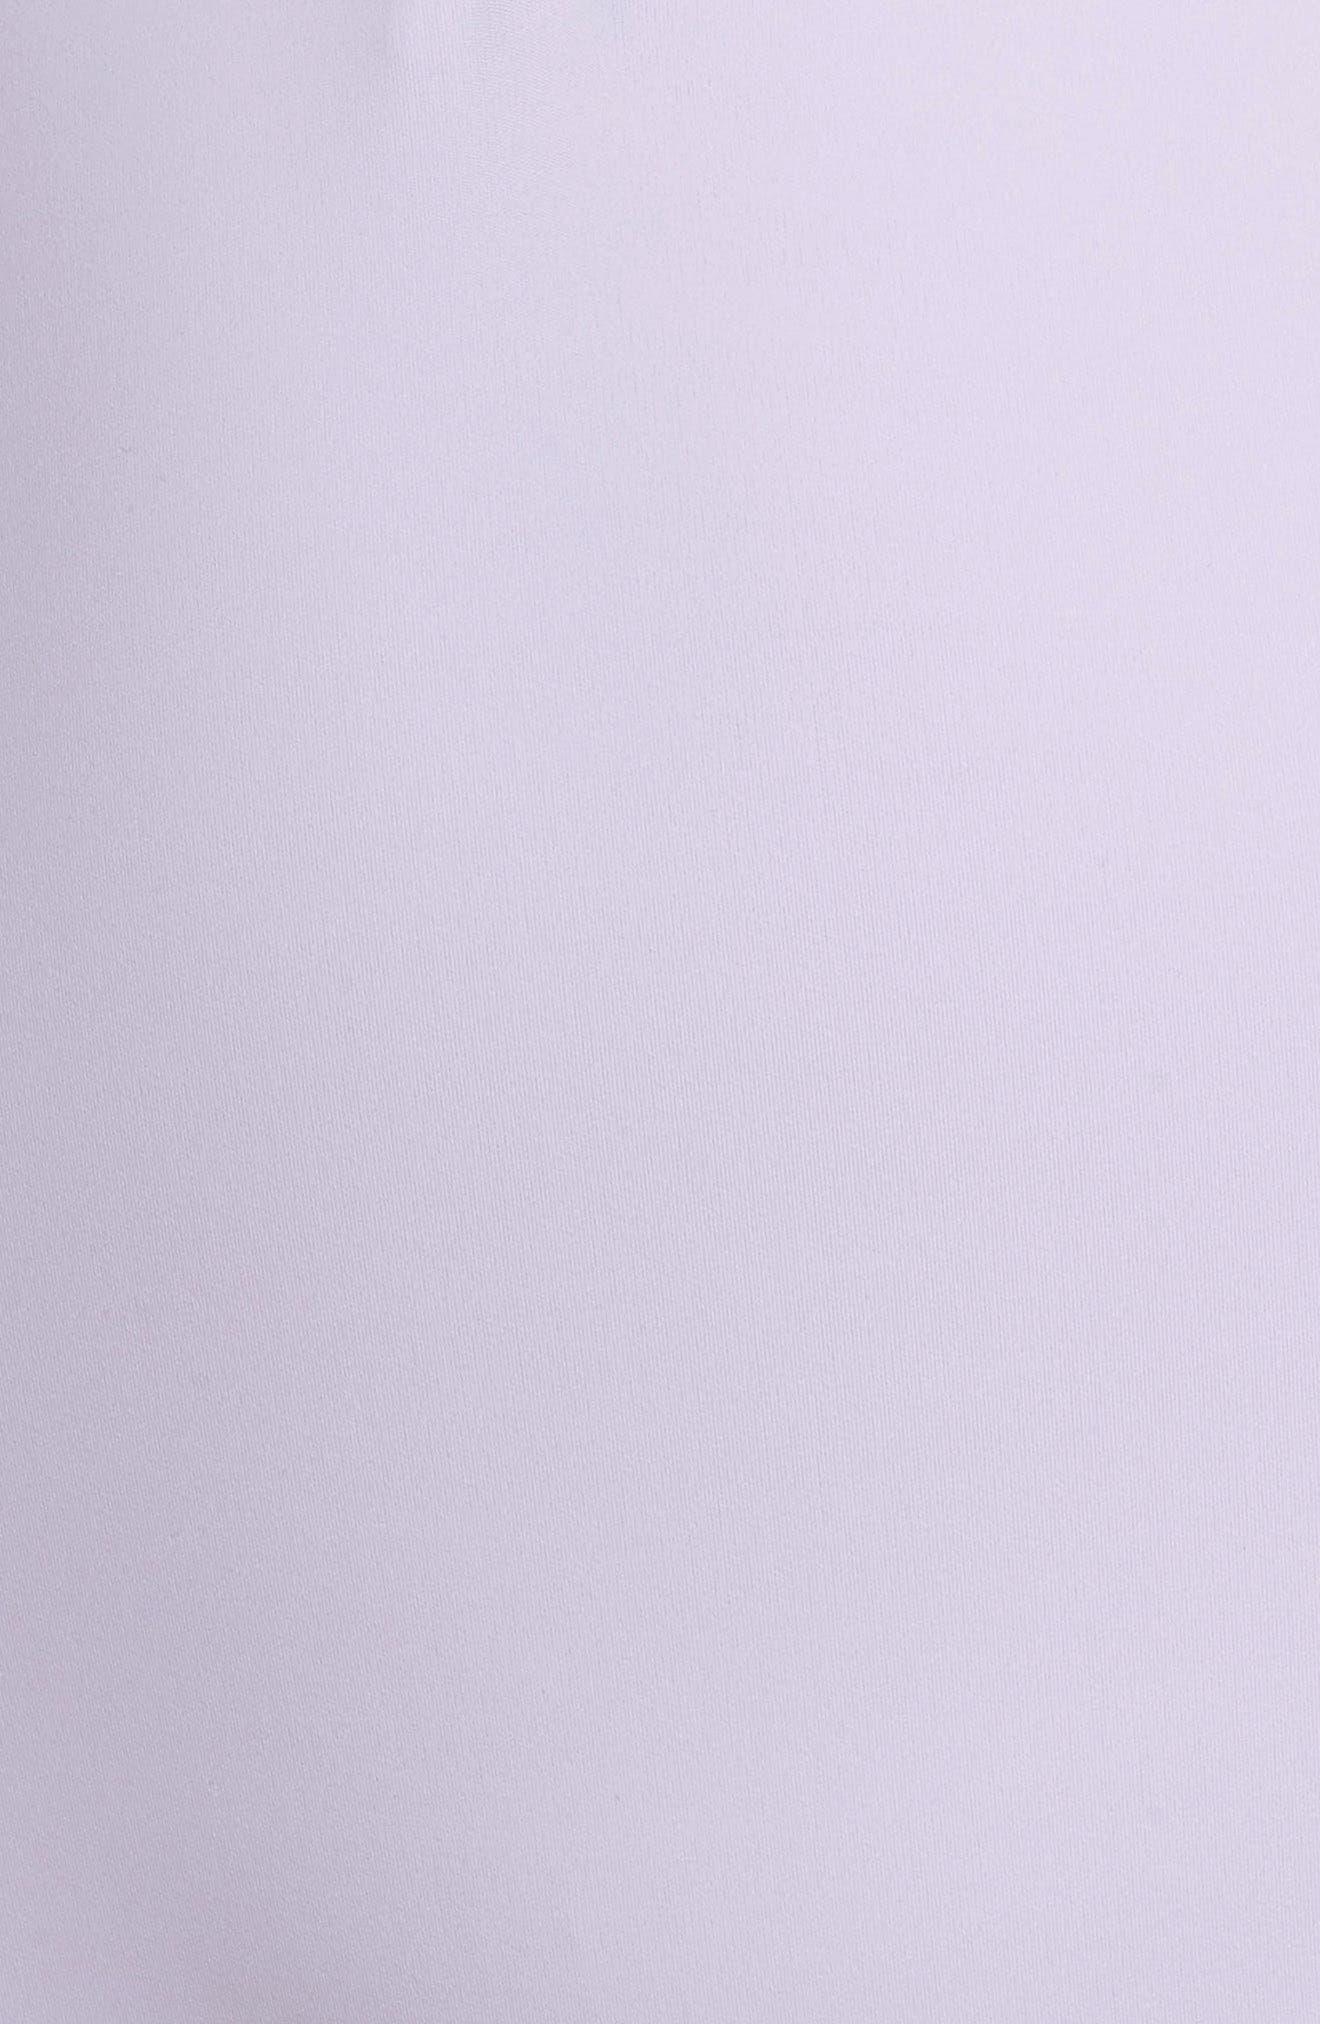 NRG Women's Dri-FIT Long Sleeve Bodysuit,                             Alternate thumbnail 6, color,                             Barely Grape/ Barely Grape